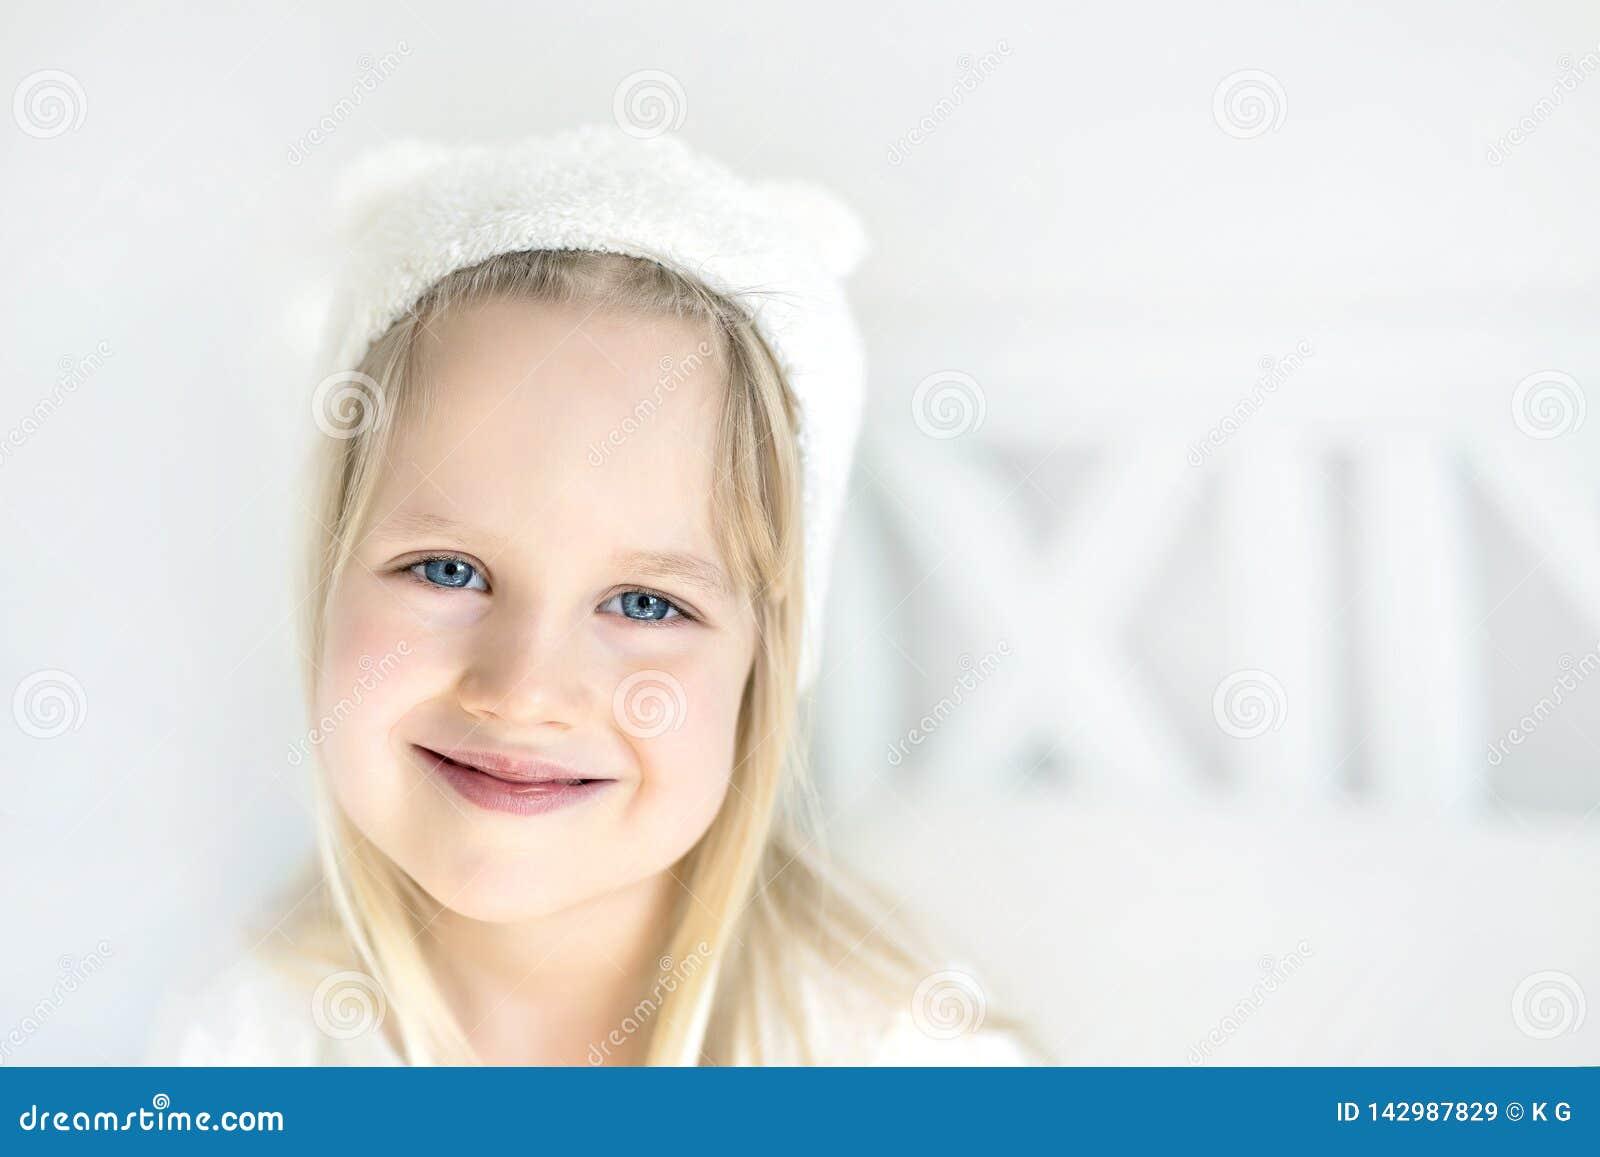 Portrait cute blond preschooler girl. Smilling kid in white hat. Child on bed in nursery room. Adorable baby wearing funny hat